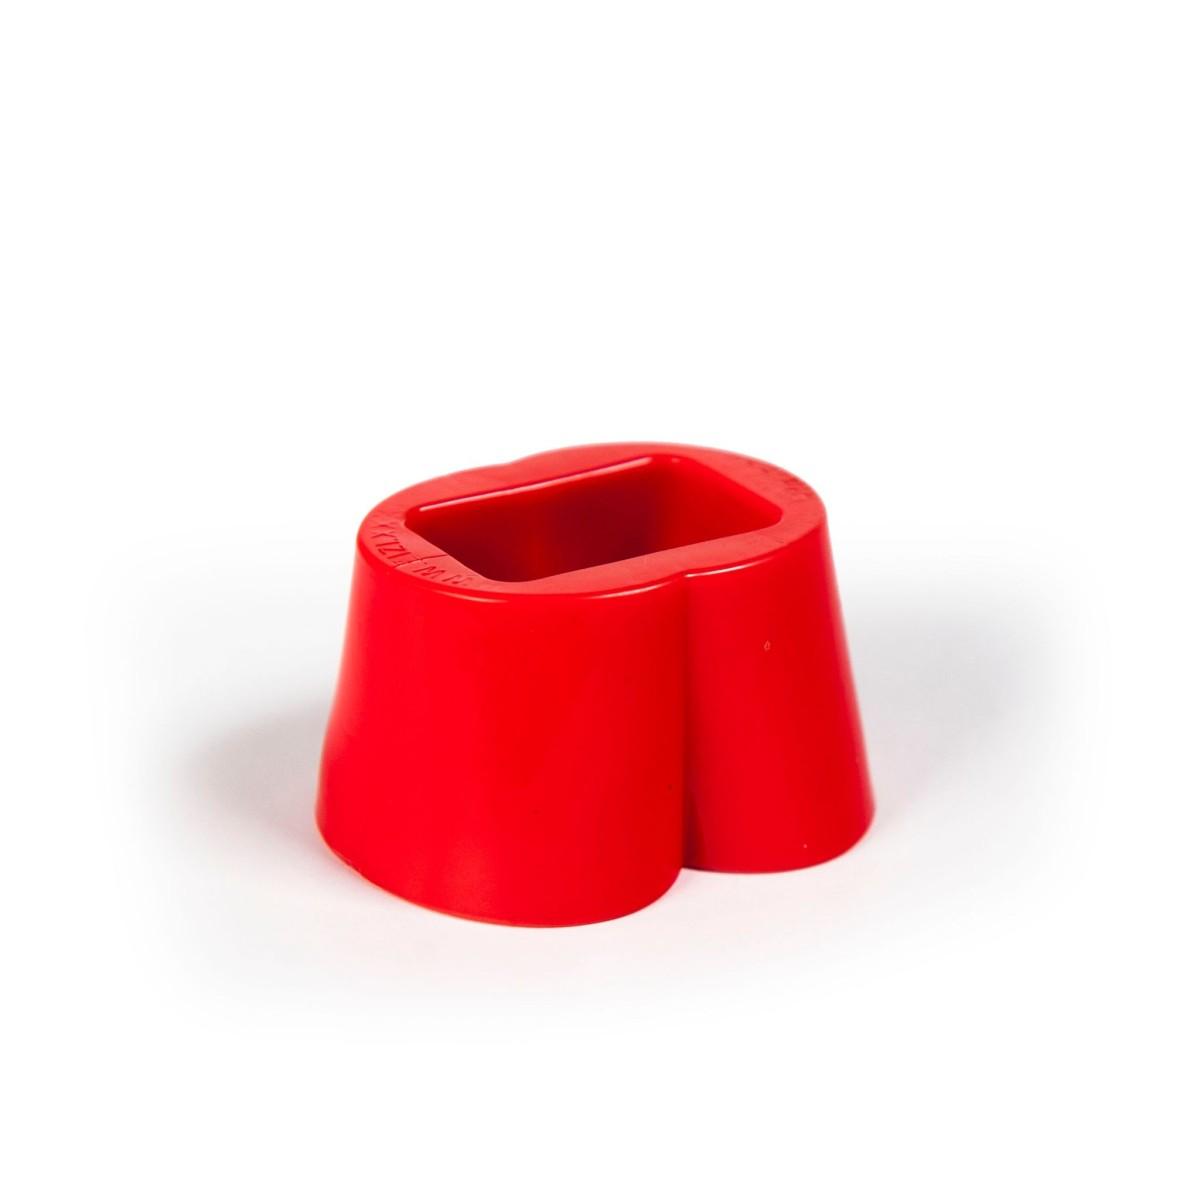 Zizi Radar Ball Stretcher Red